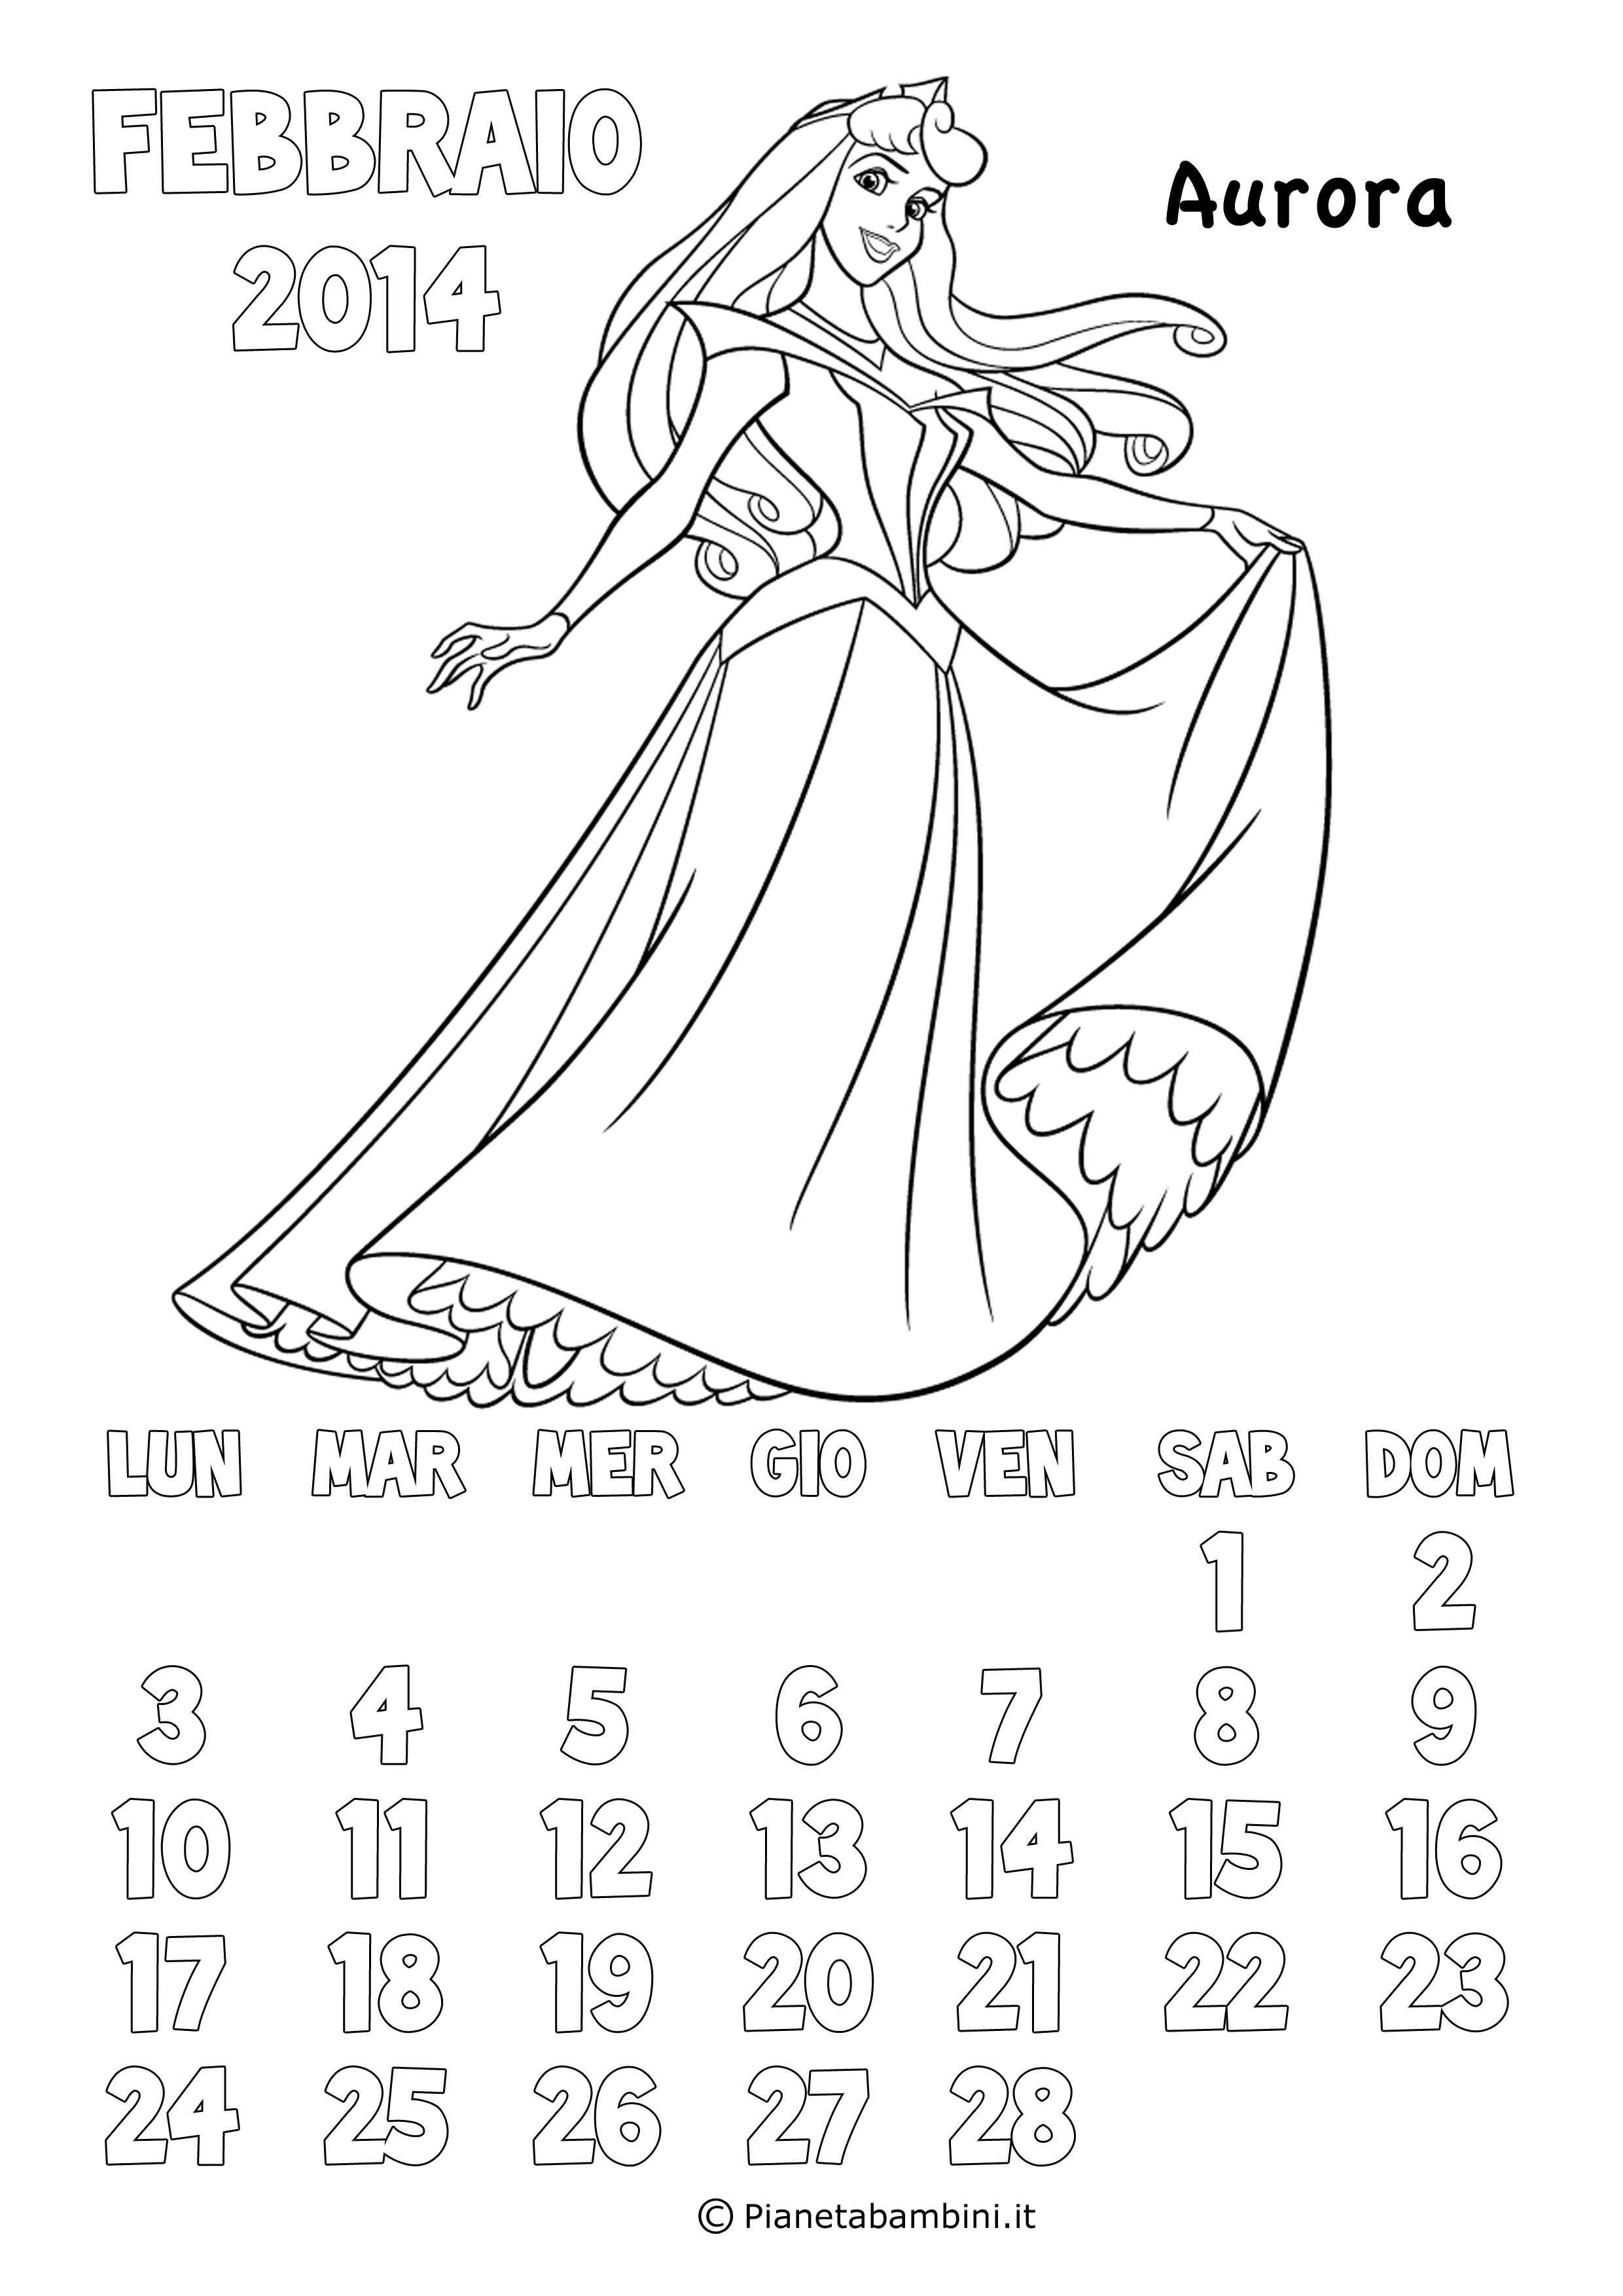 Calendario 2017 Delle Principesse Disney Da Colorare Nel 2020 Principesse Disney Principesse Disney